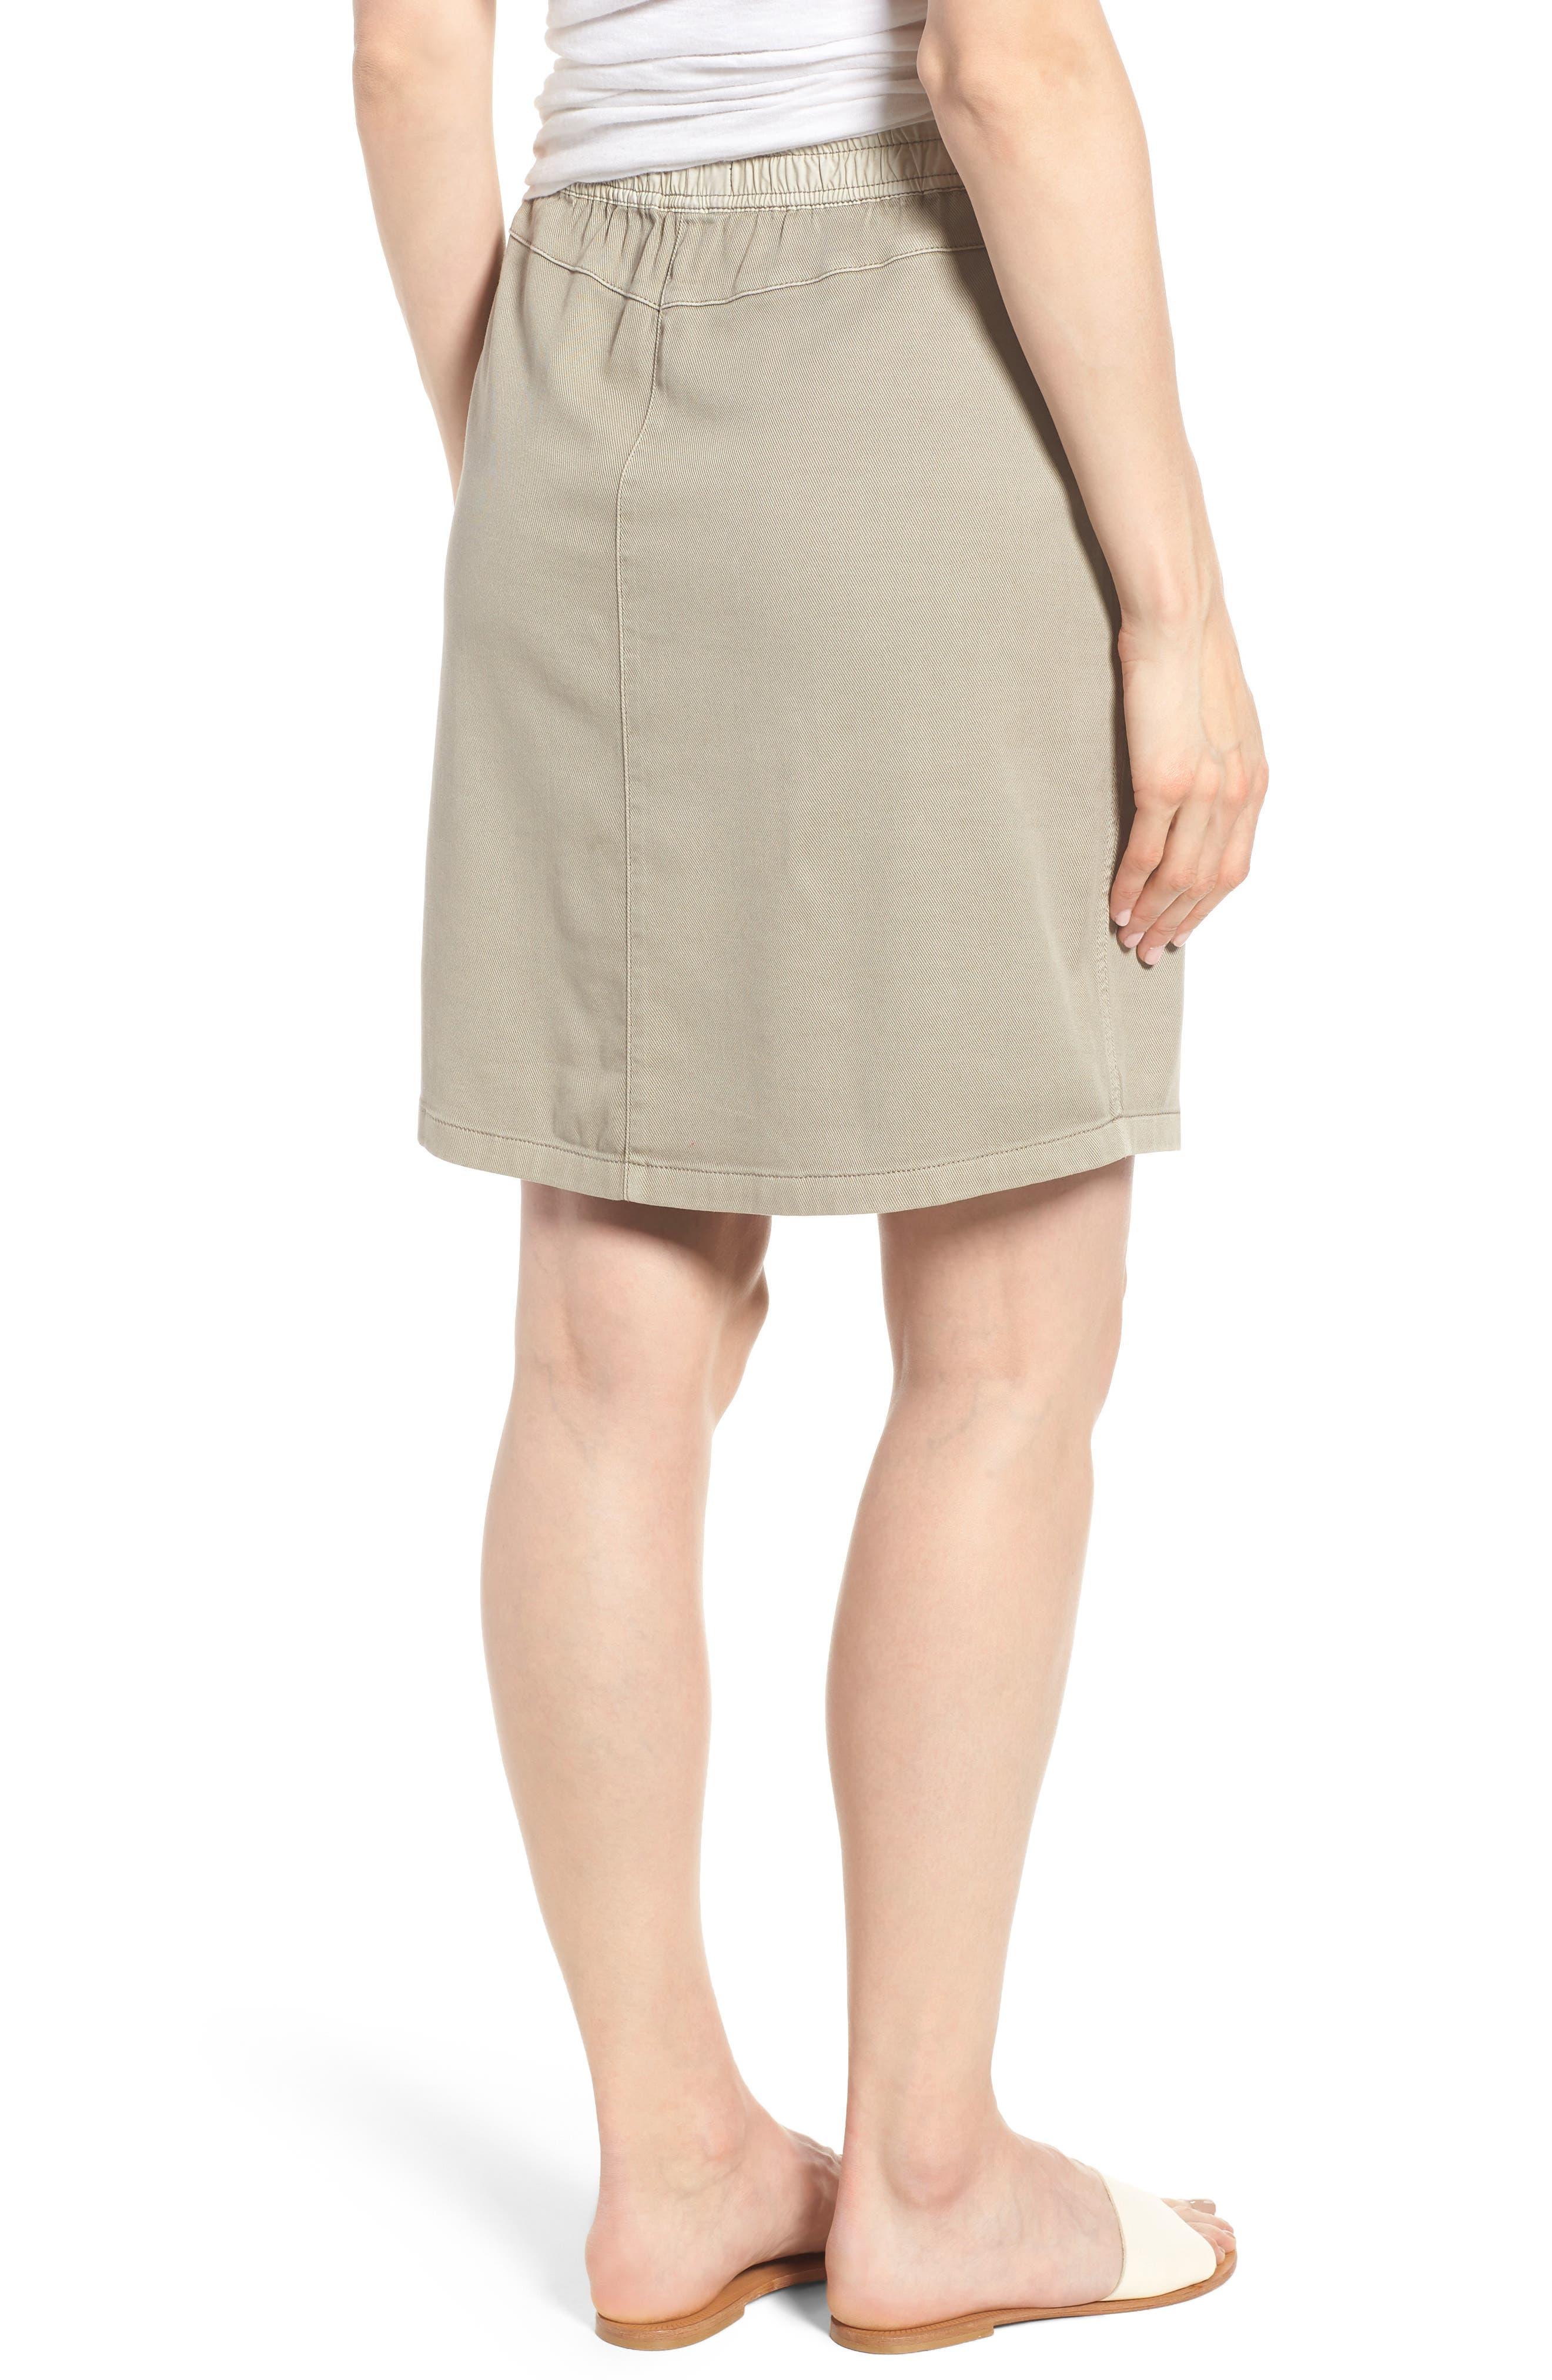 Open Road Skirt,                             Alternate thumbnail 2, color,                             FLAX